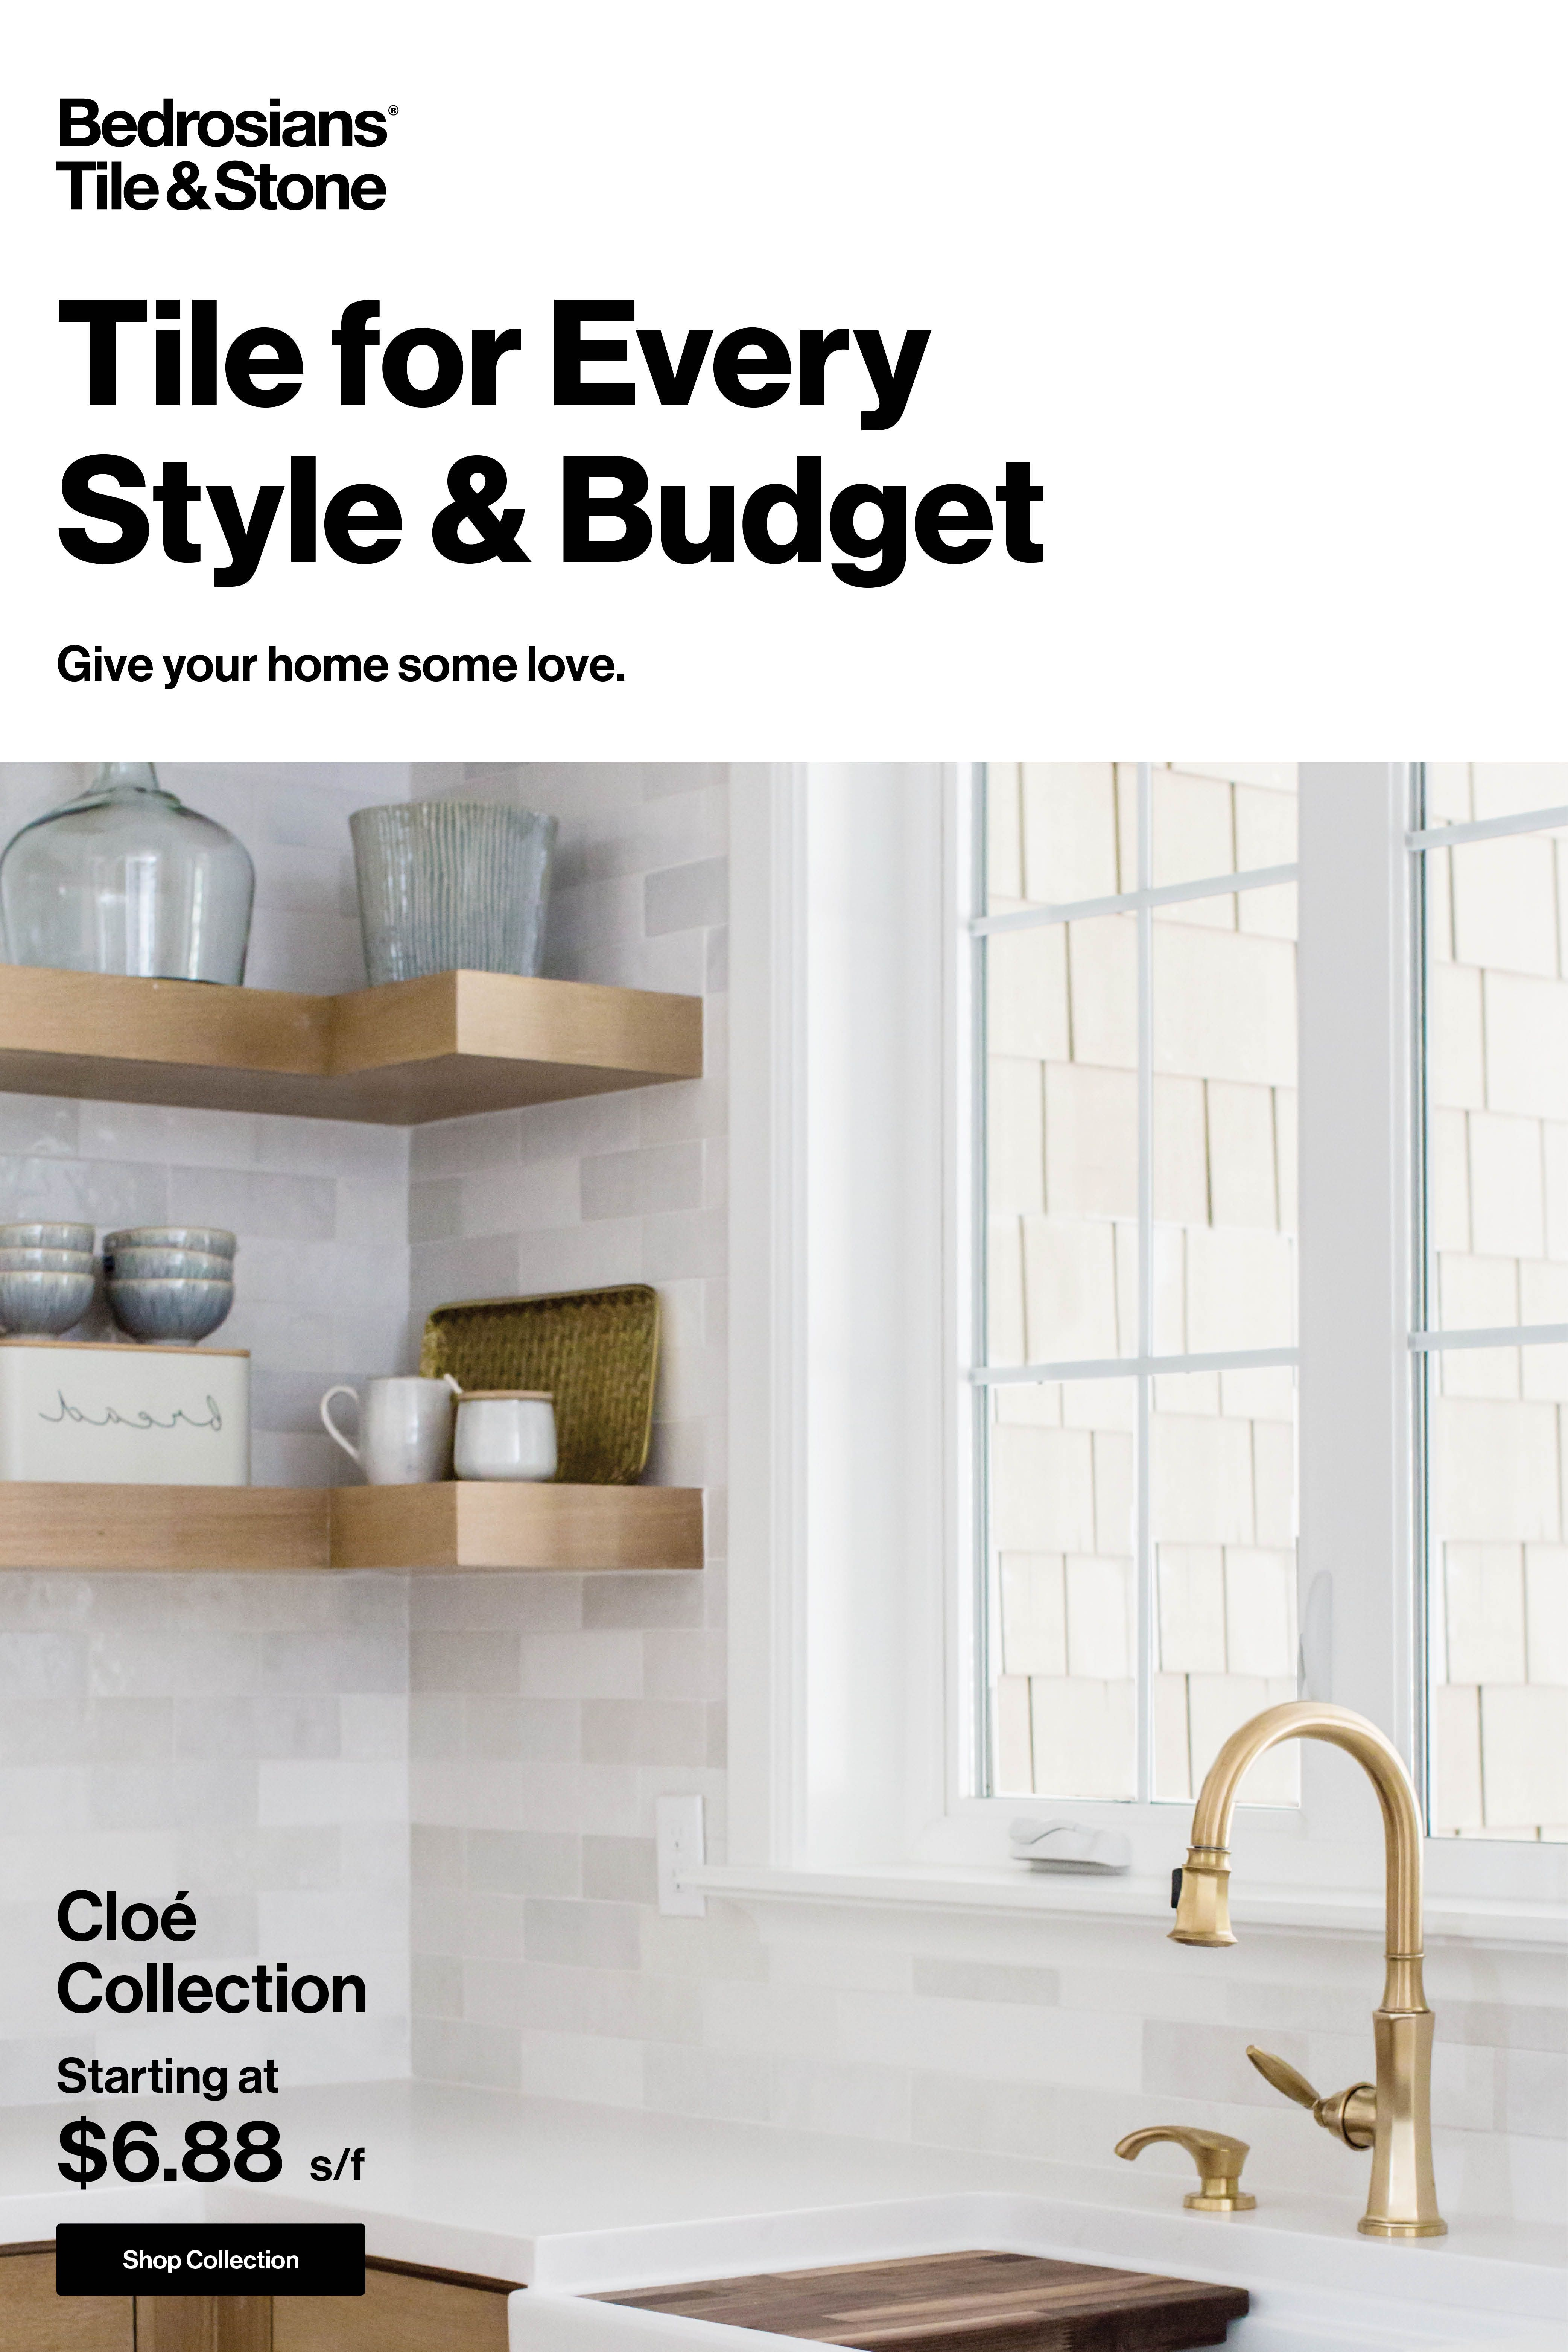 cloe 2 5 x 8 ceramic tile in white kitchen remodel small lake house kitchen kitchen inspirations